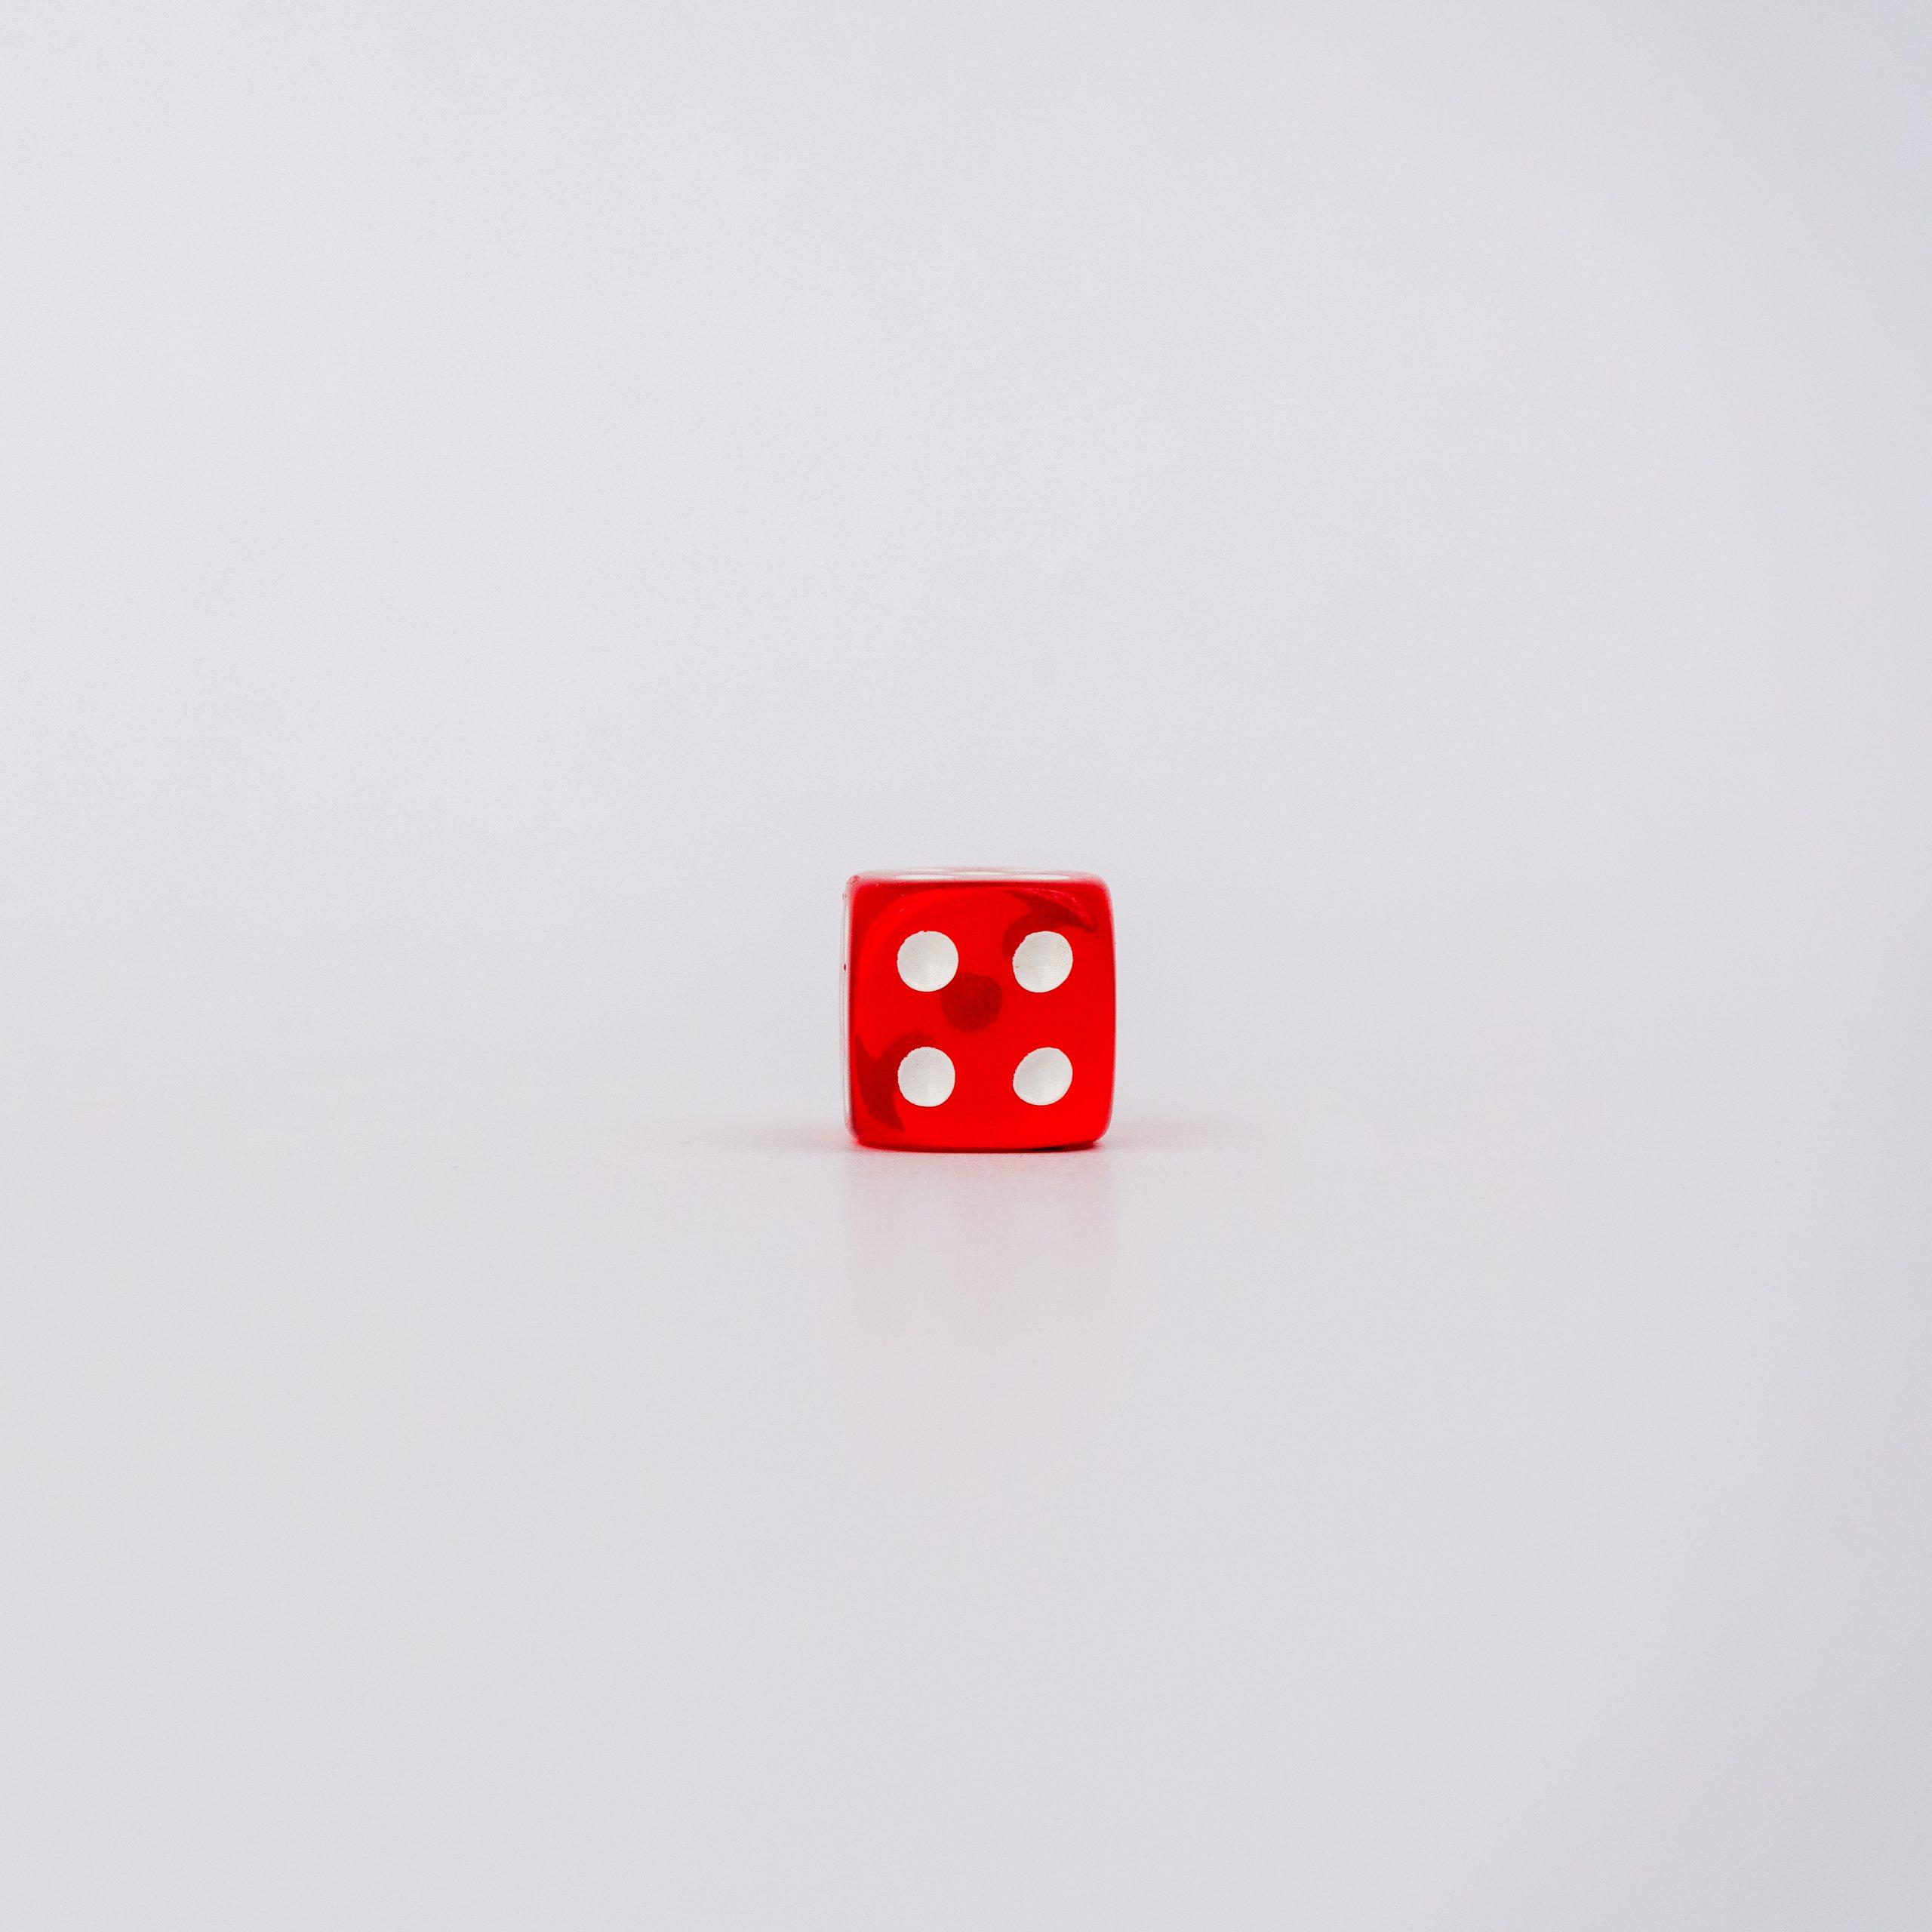 Four on dice